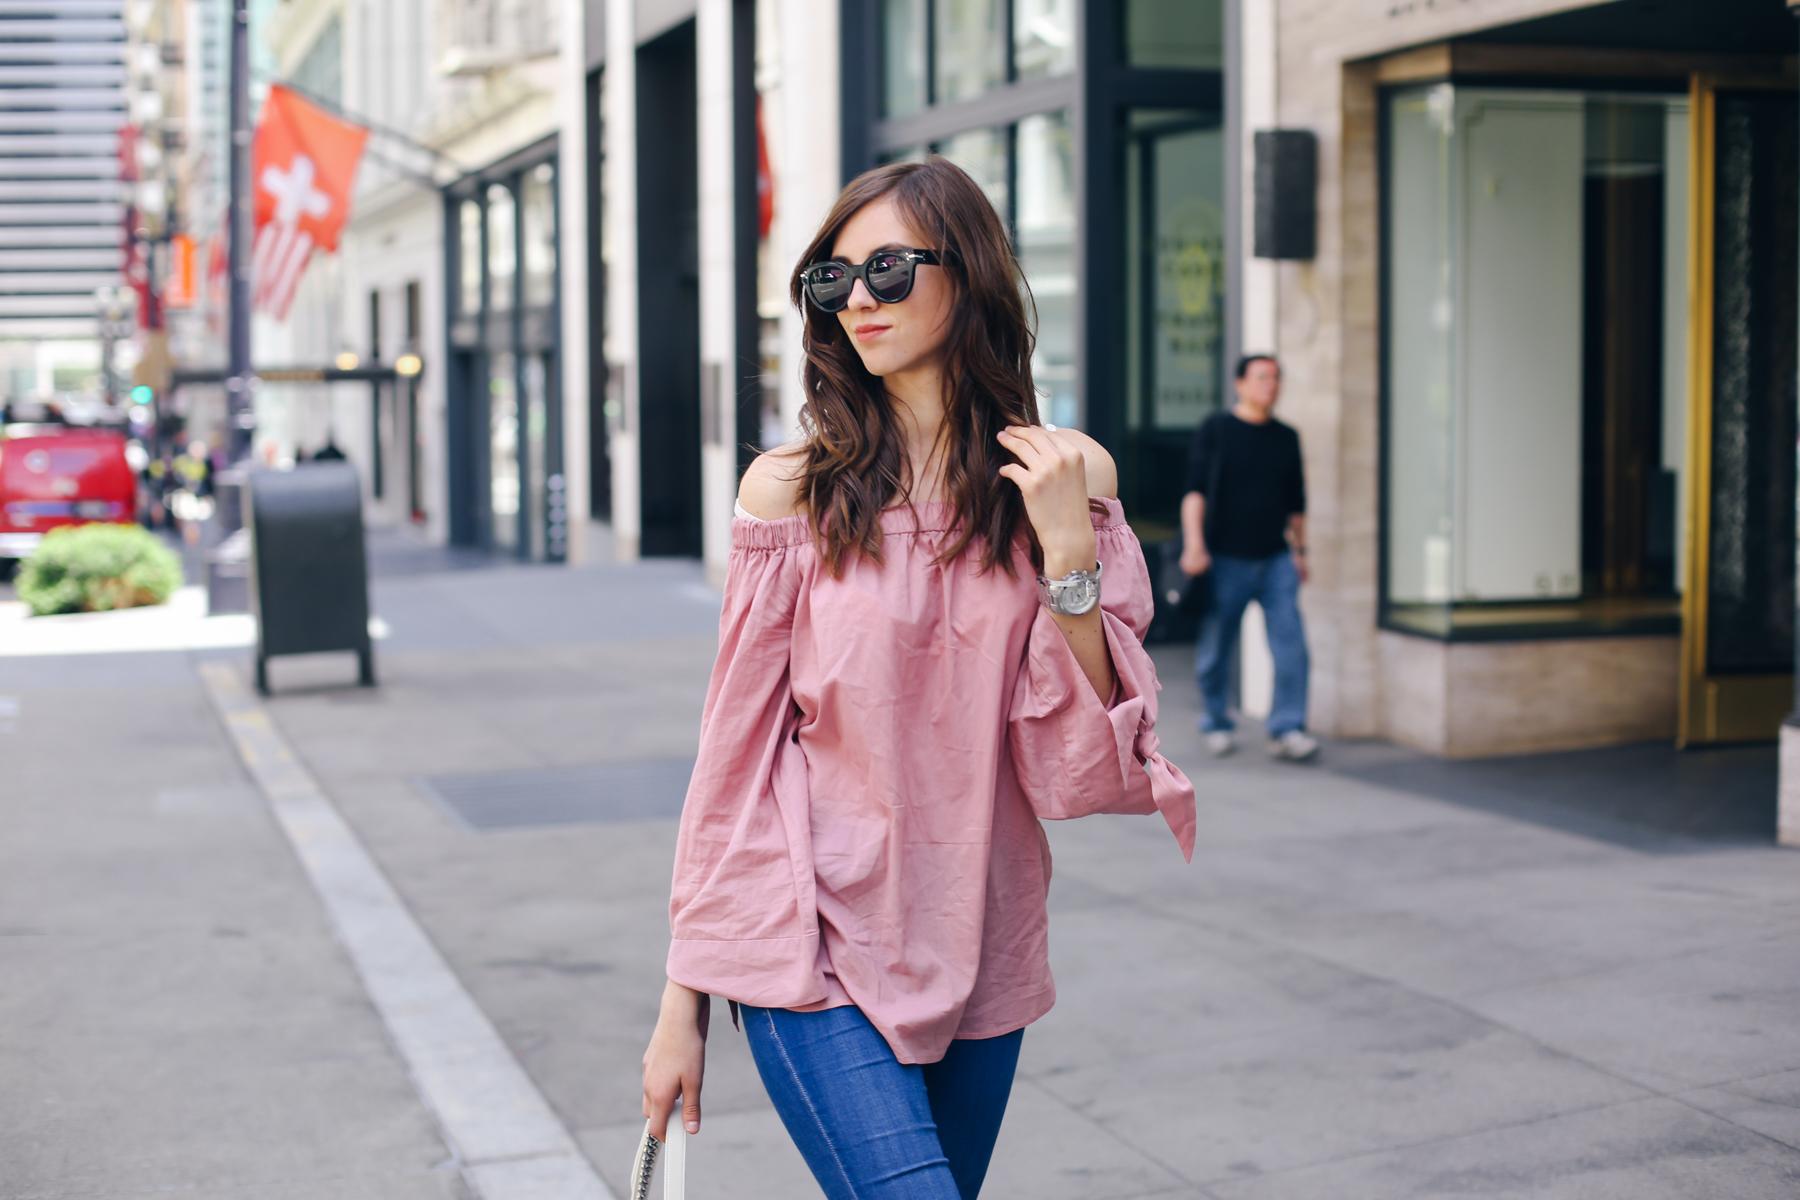 Barbora-Ondracova-FashioninmySoul-Fashion-Blogger-Photography-RyanbyRyanChua-7147